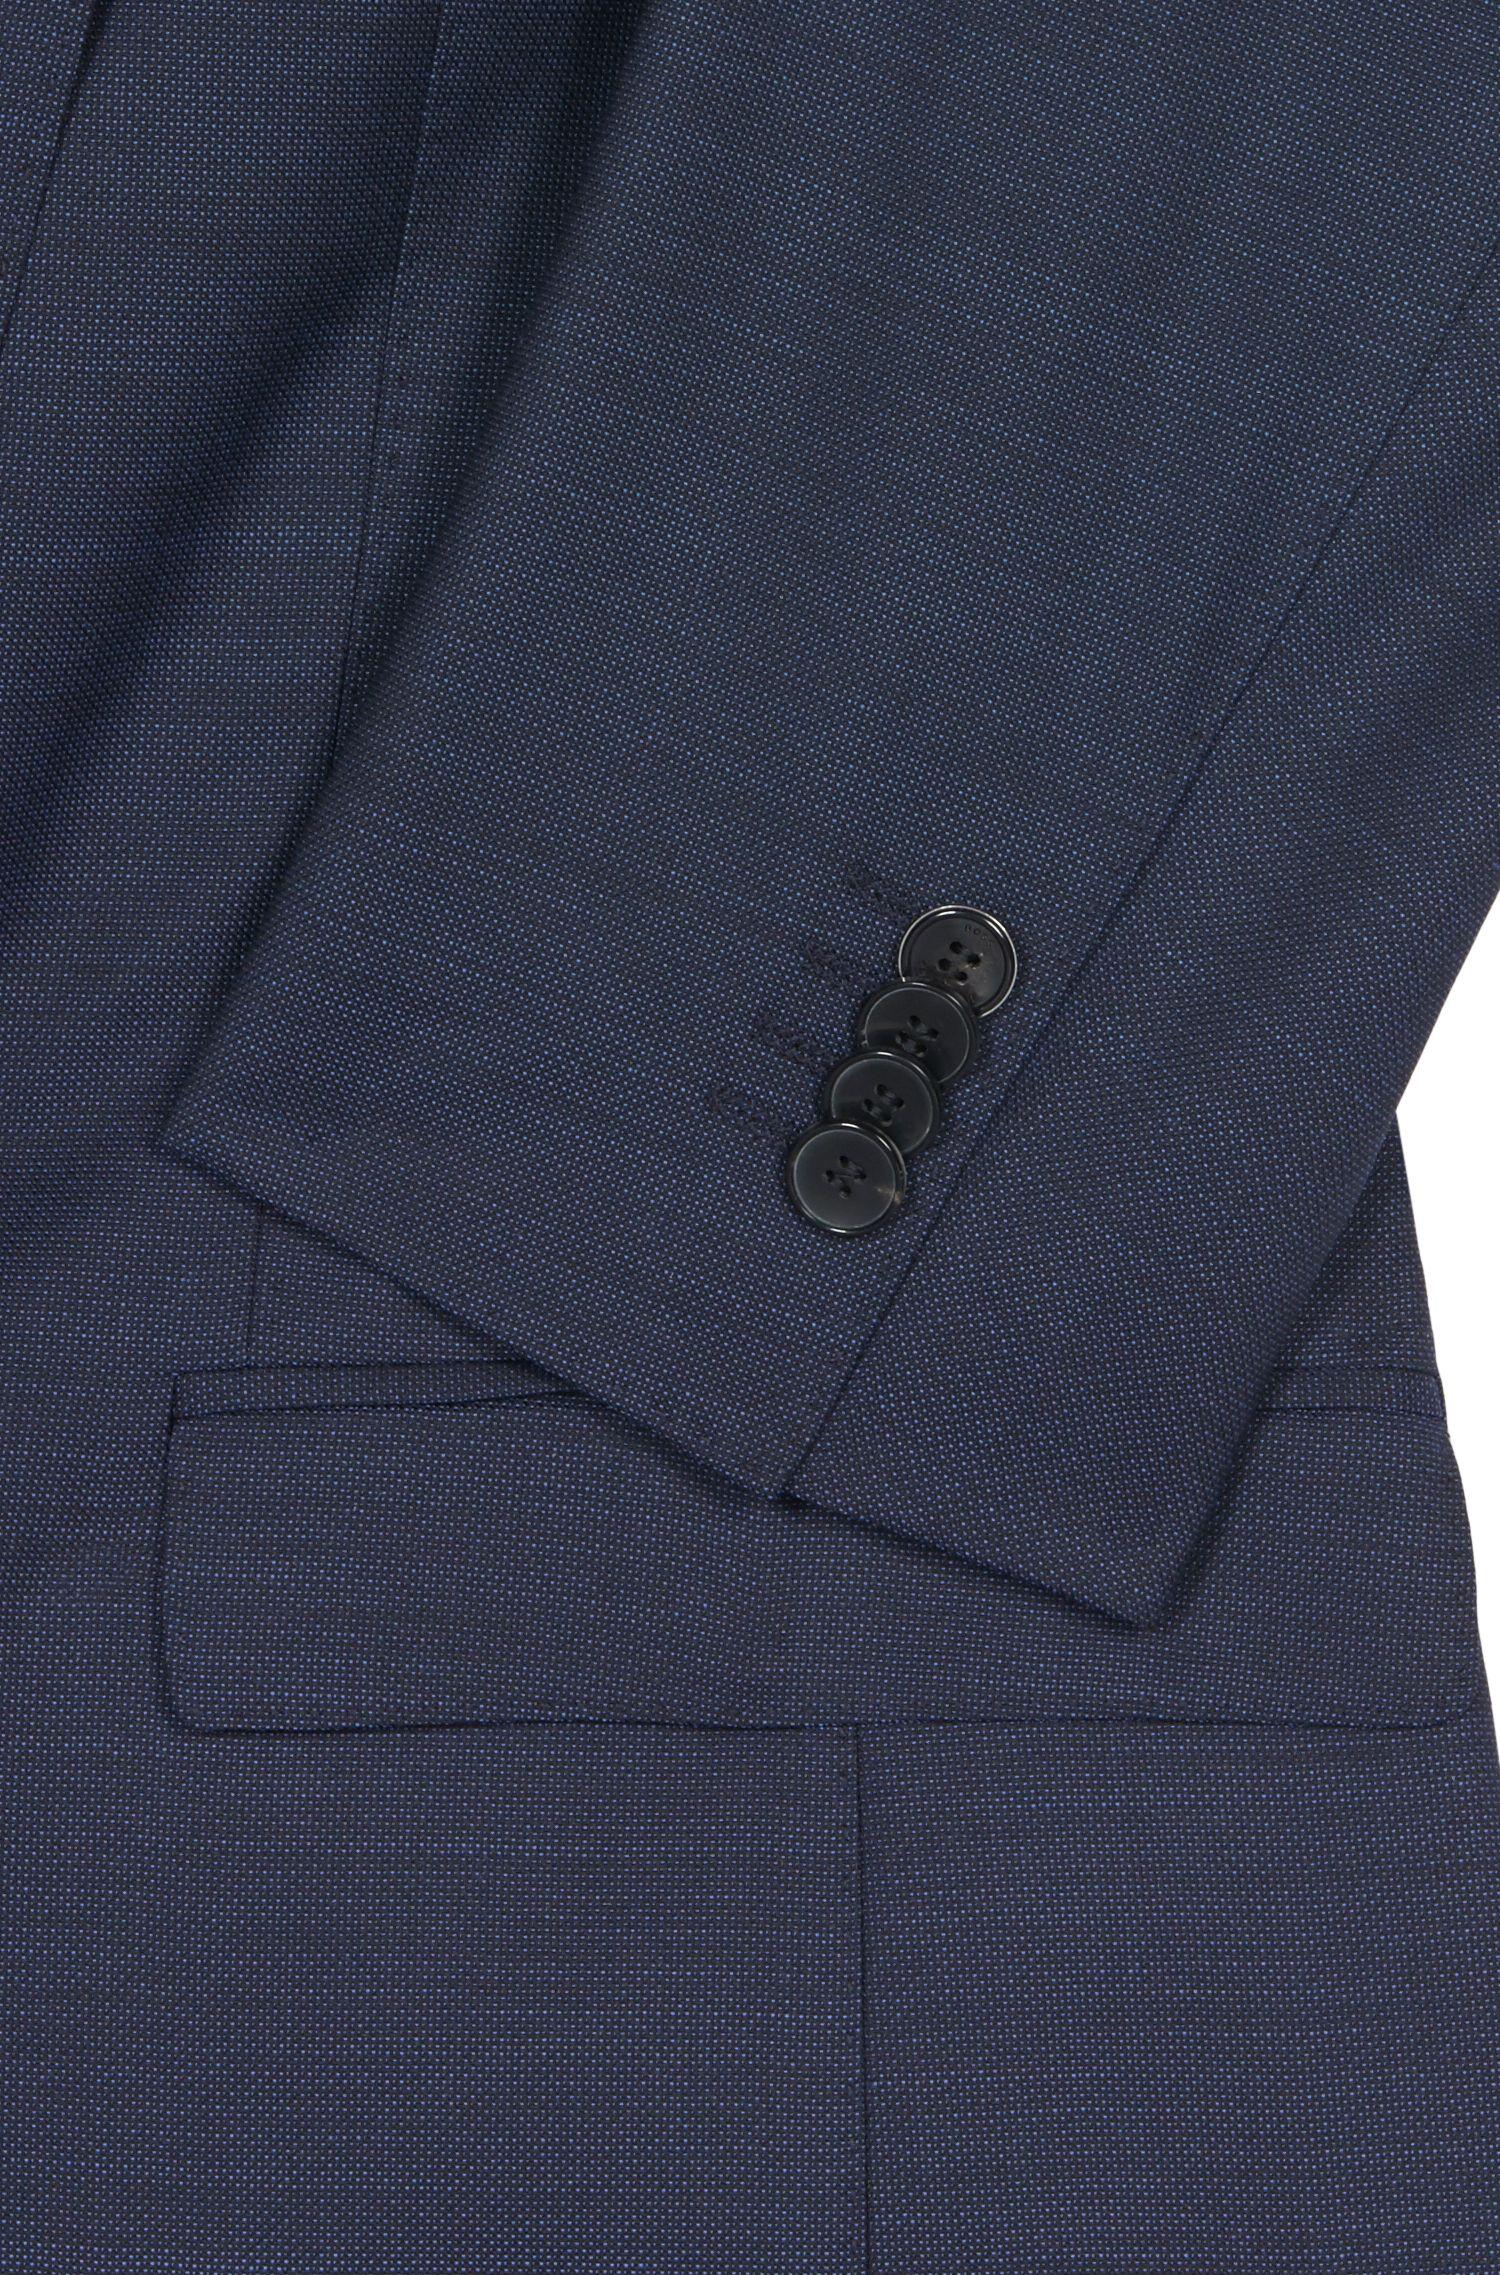 Birdseye Italian Super 100 Virgin Wool Suit, Extra-Slim Fit   Reyno/Wave, Dark Blue